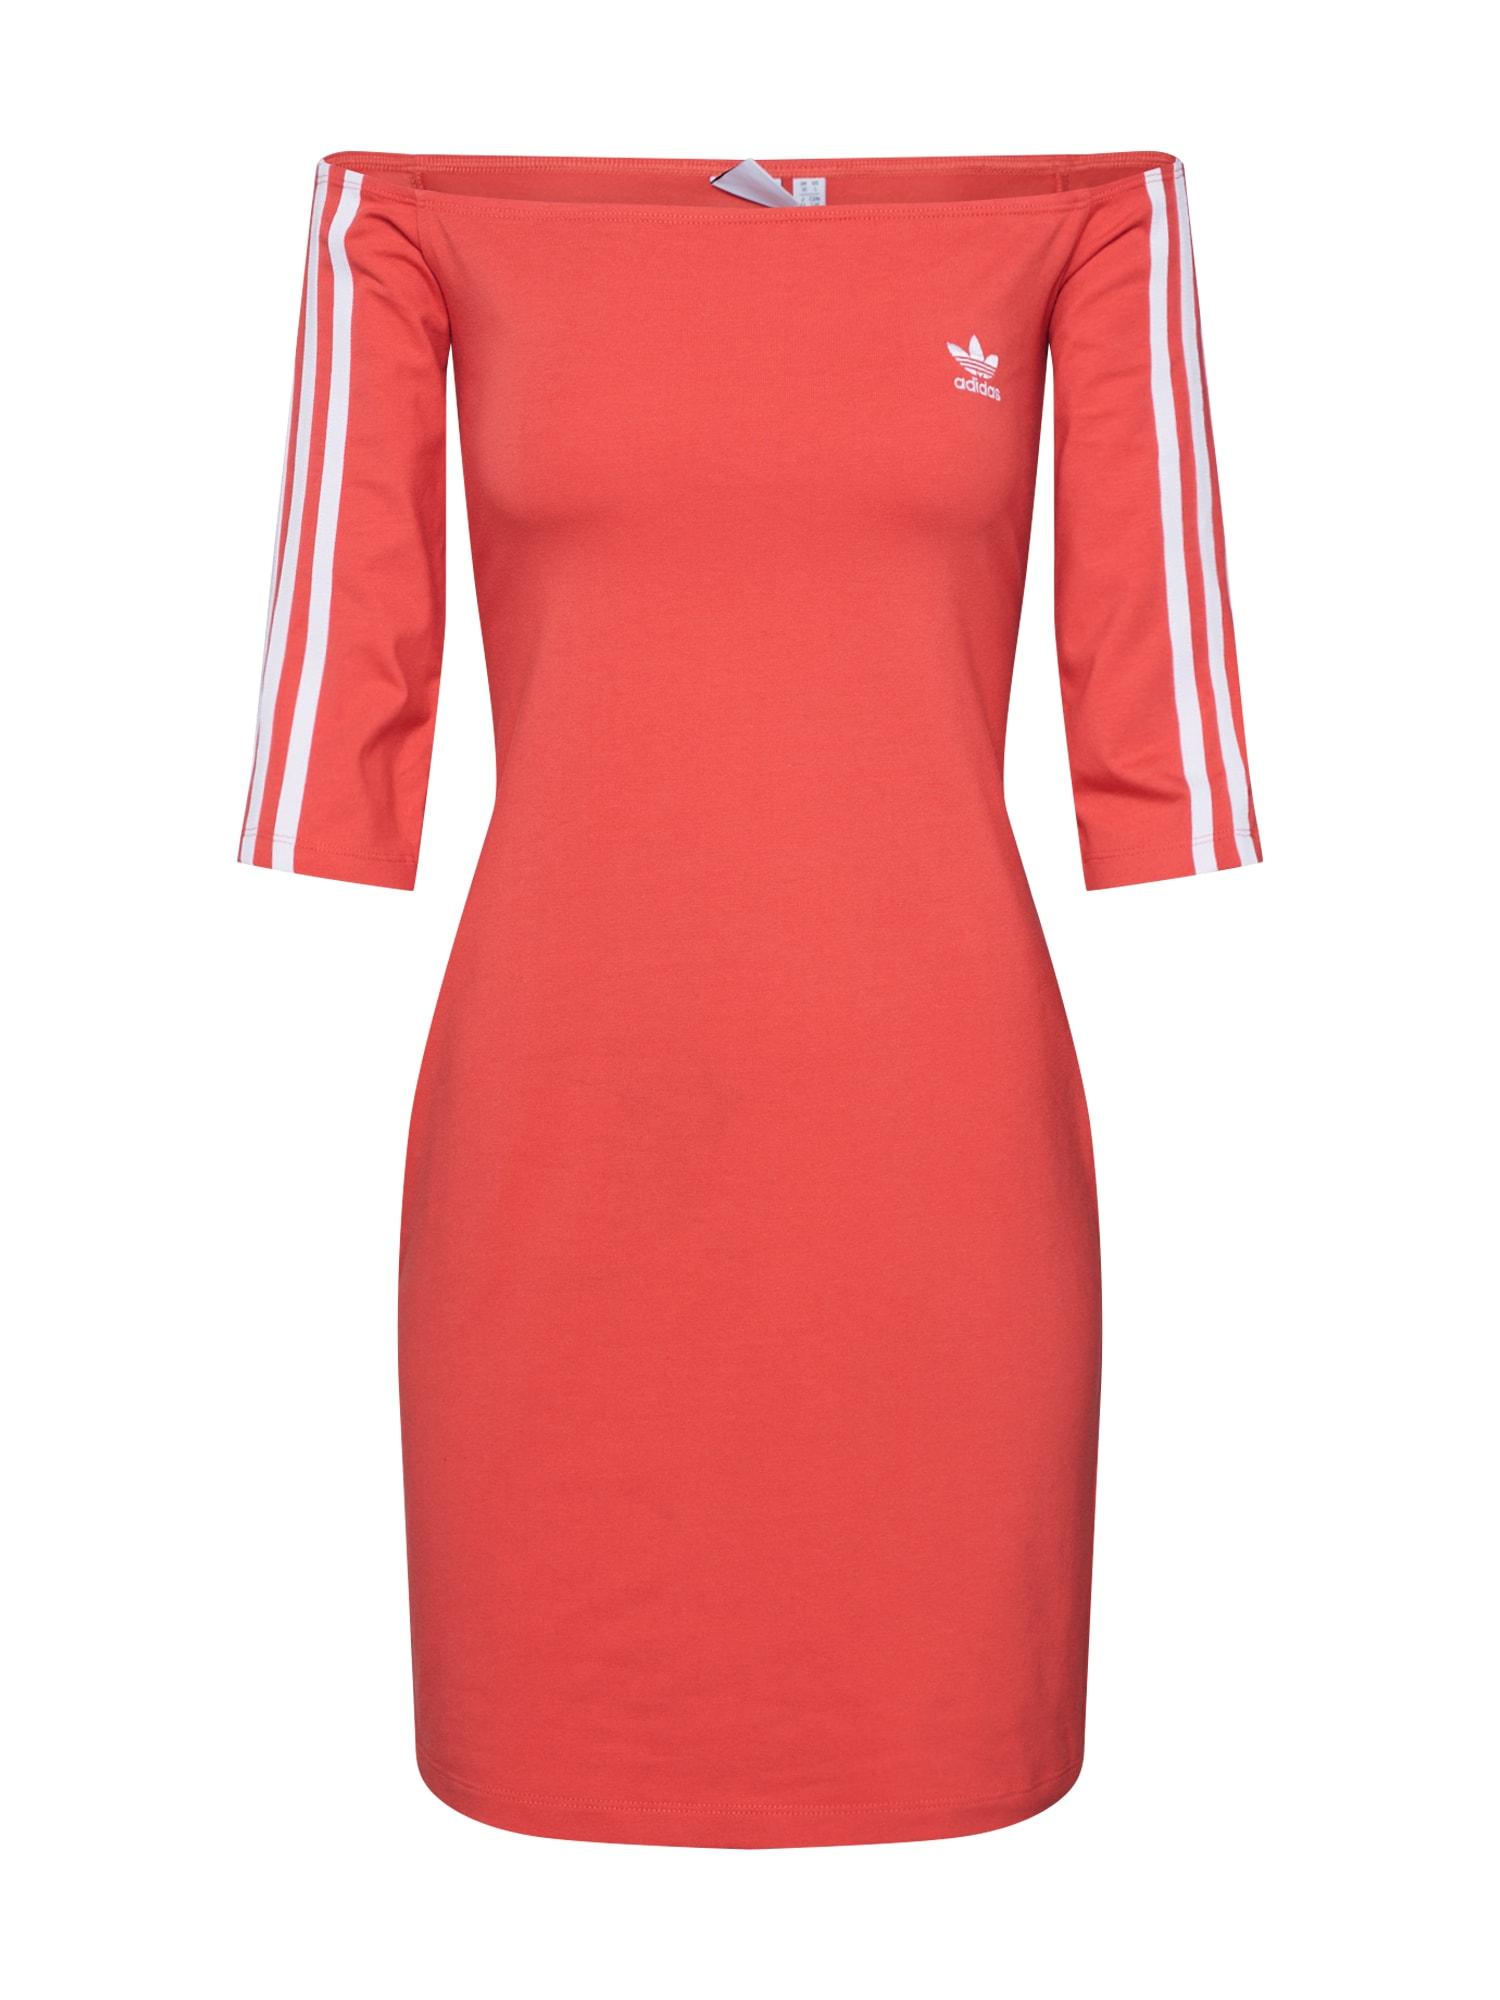 ADIDAS ORIGINALS Suknelė raudona